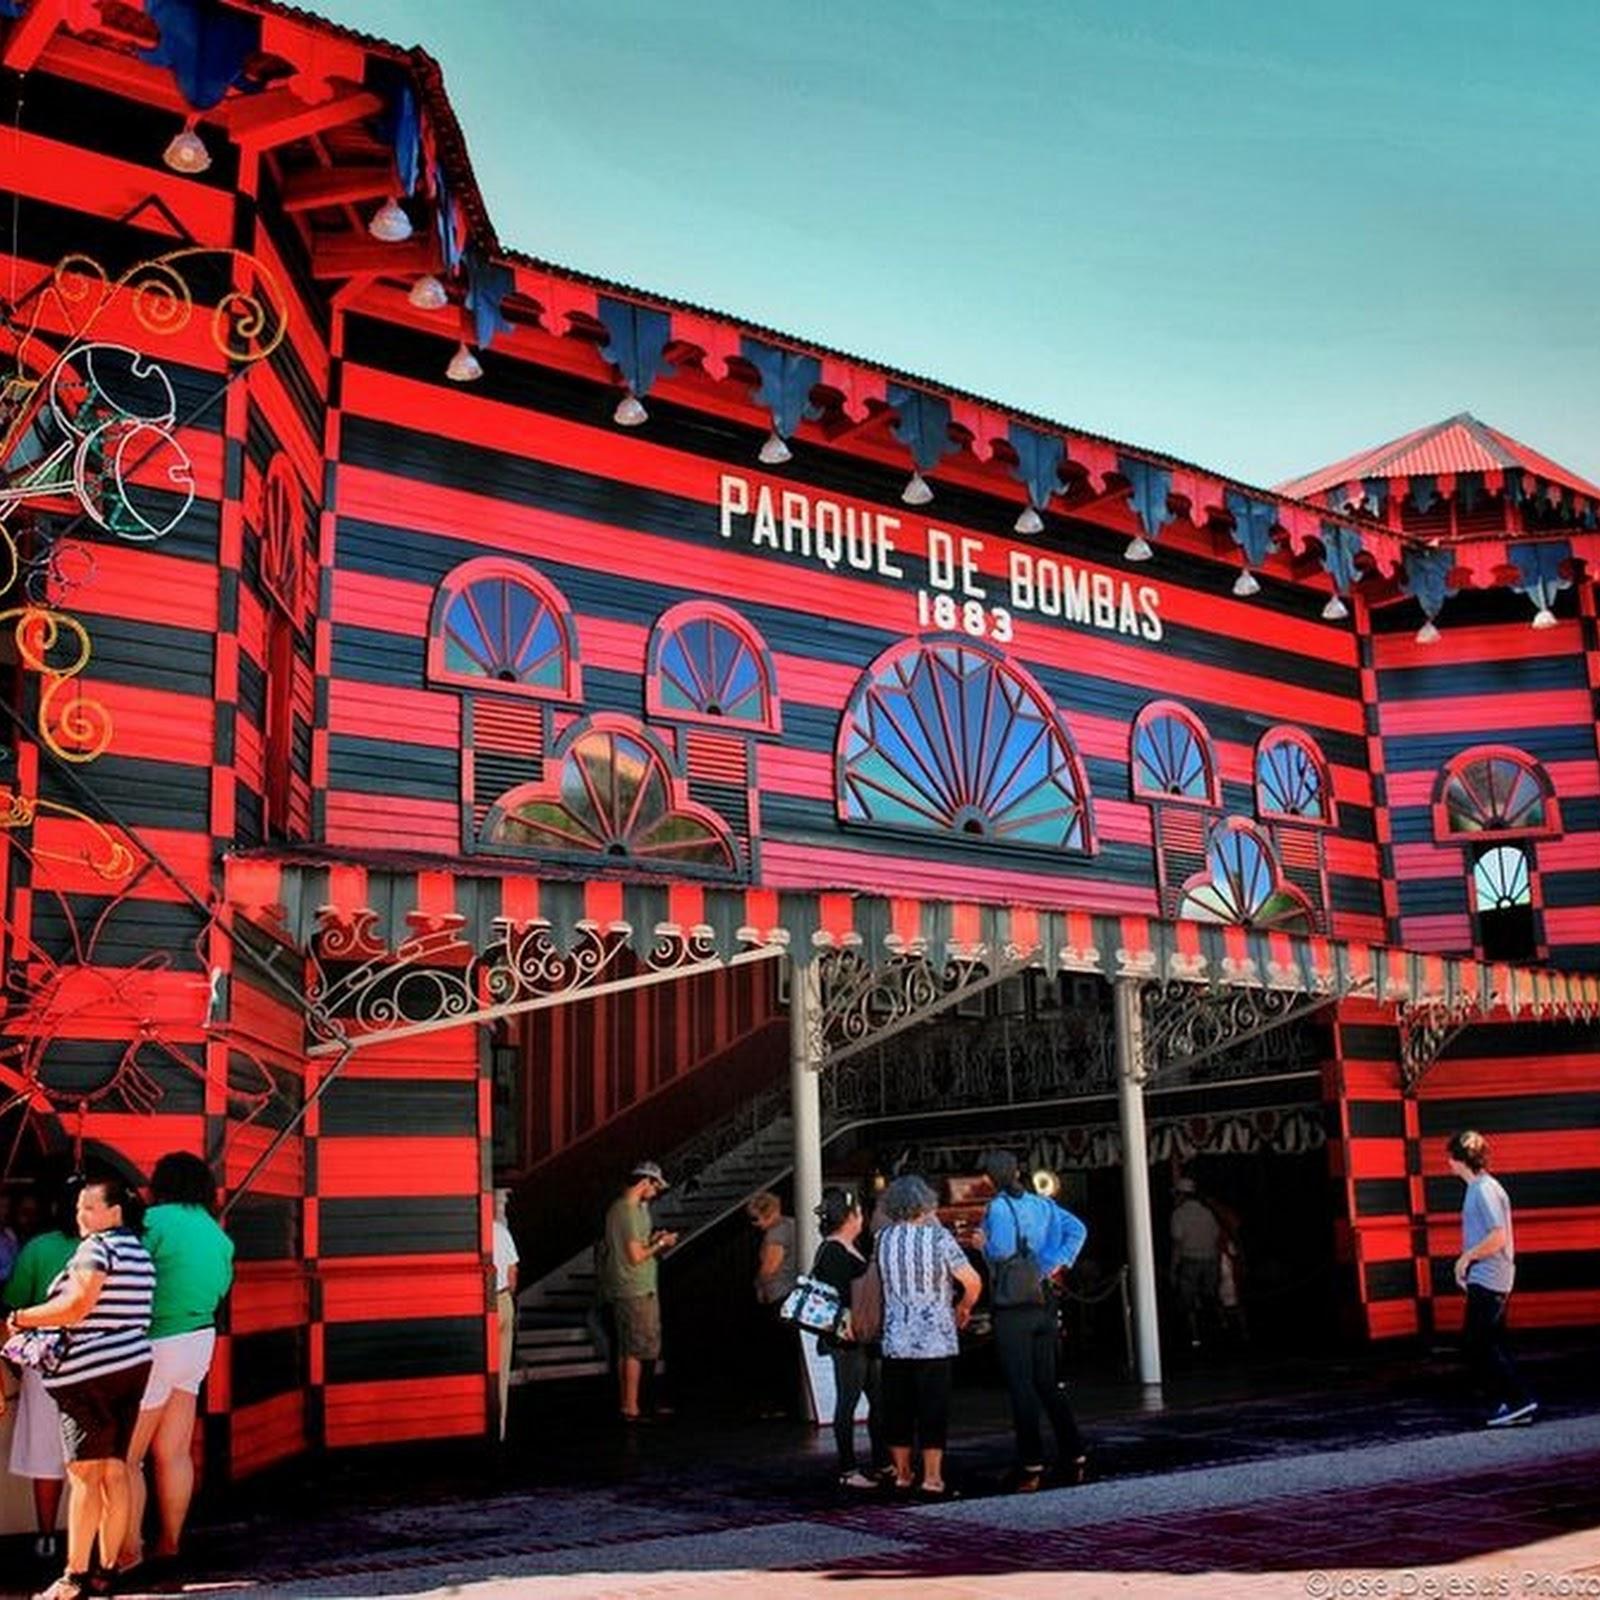 Parque de Bombas: The Old Ponce Fire Station